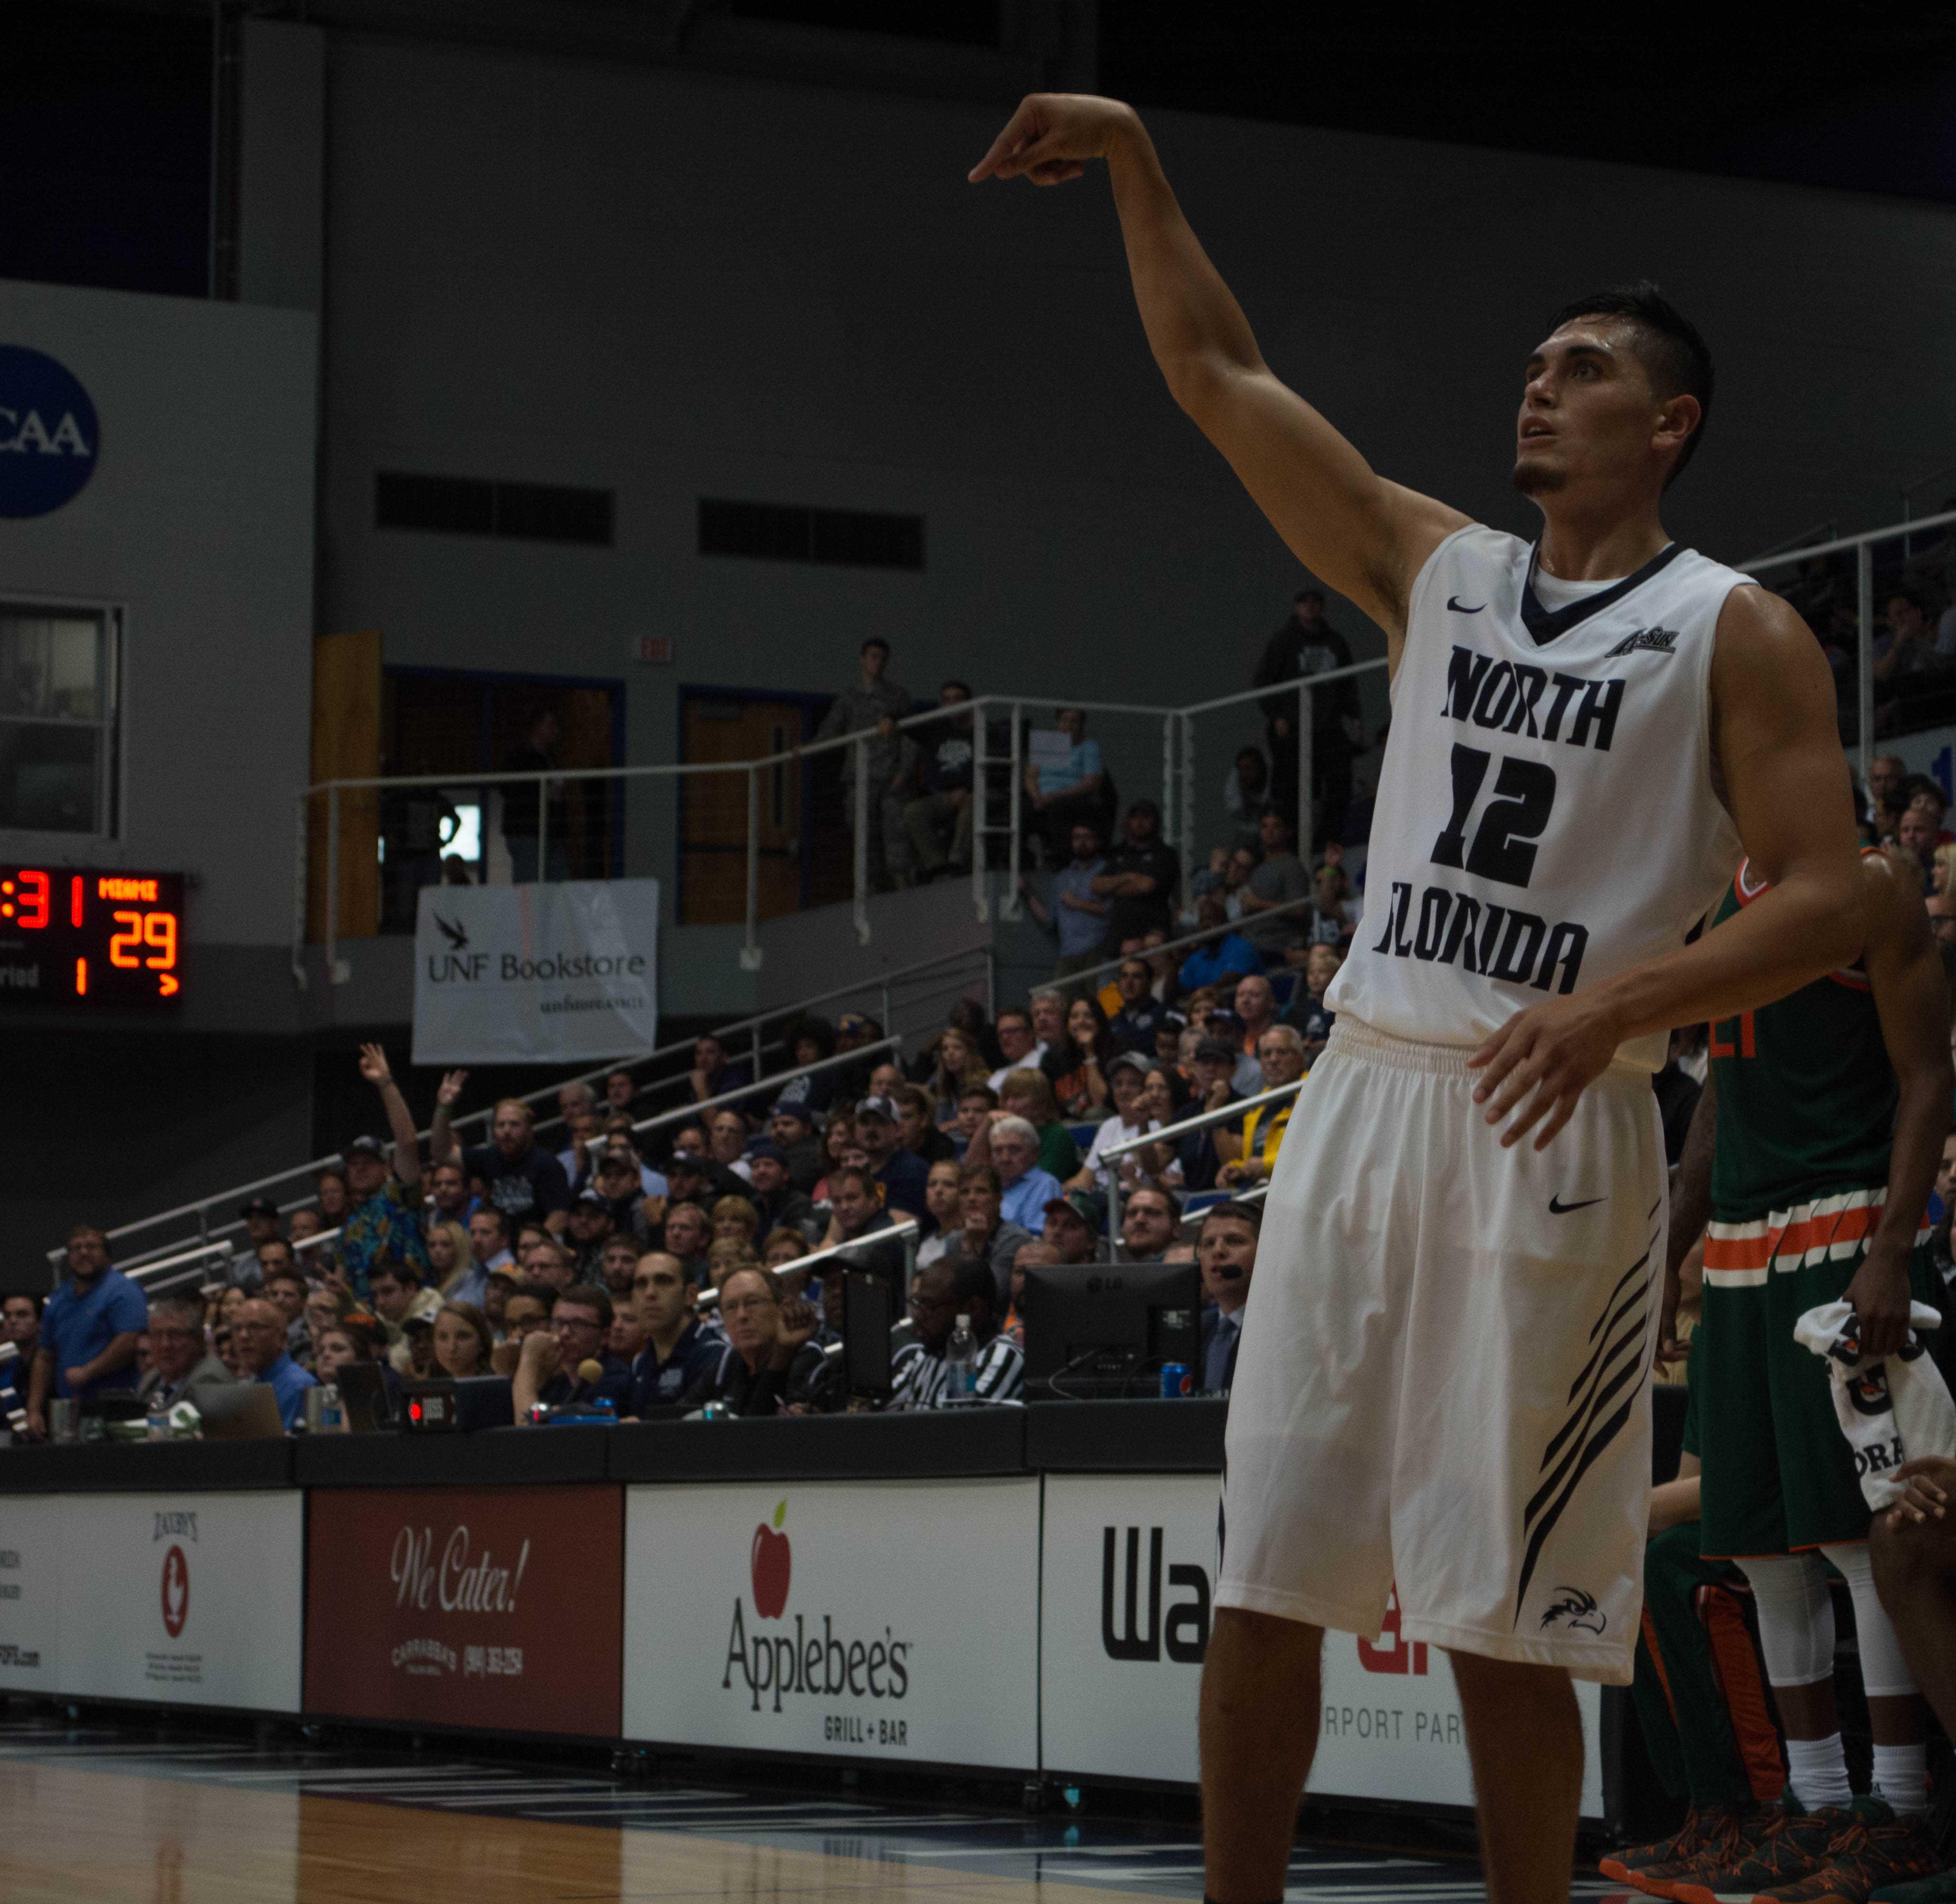 LSU hangs on to beat North Florida 78-70